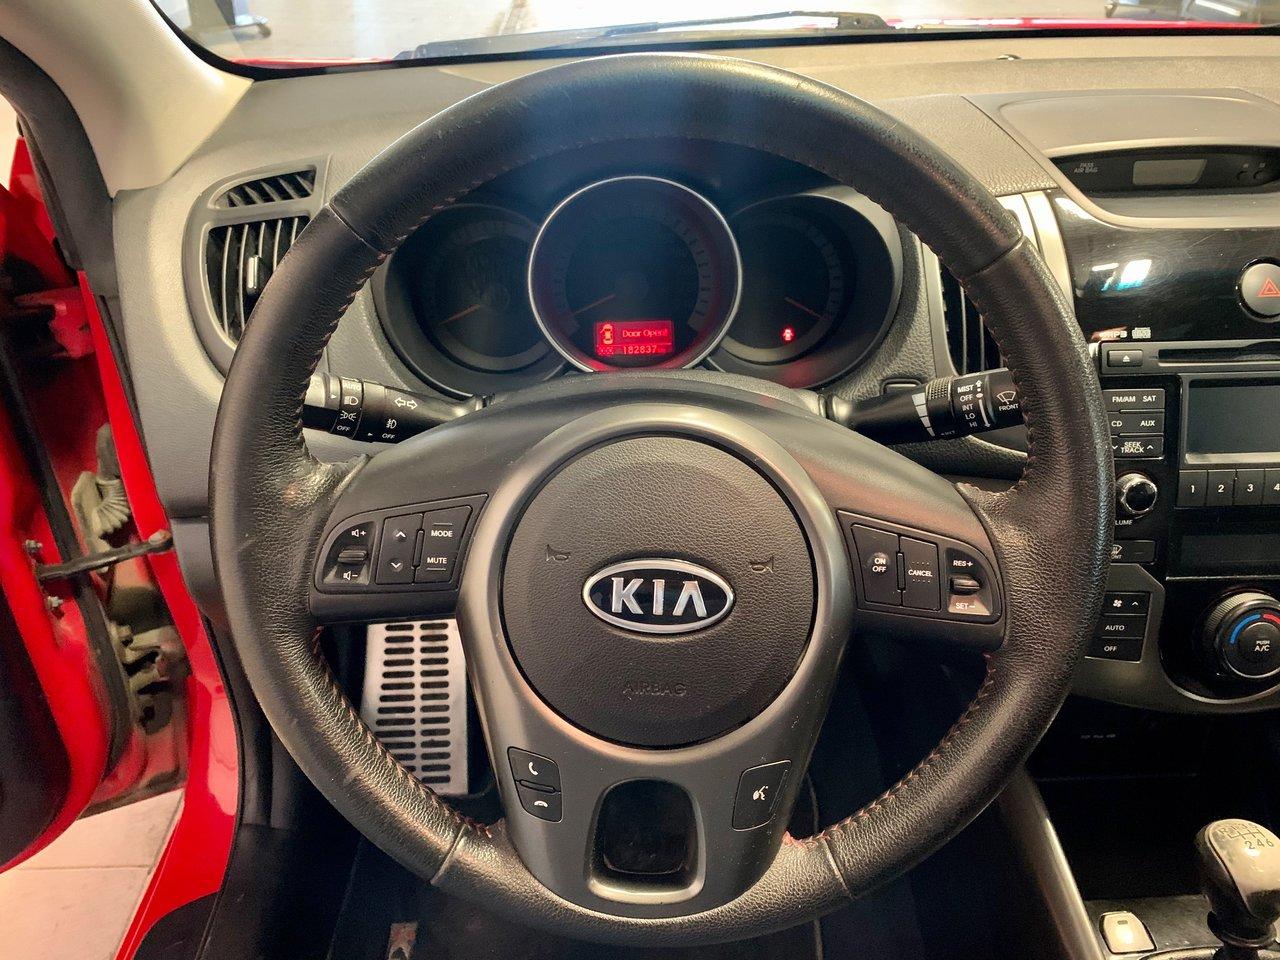 2011 Kia Forte Koup SX / SIÈGES CHAUFFANTS + CUIR JAMAIS ACCIDENTEE